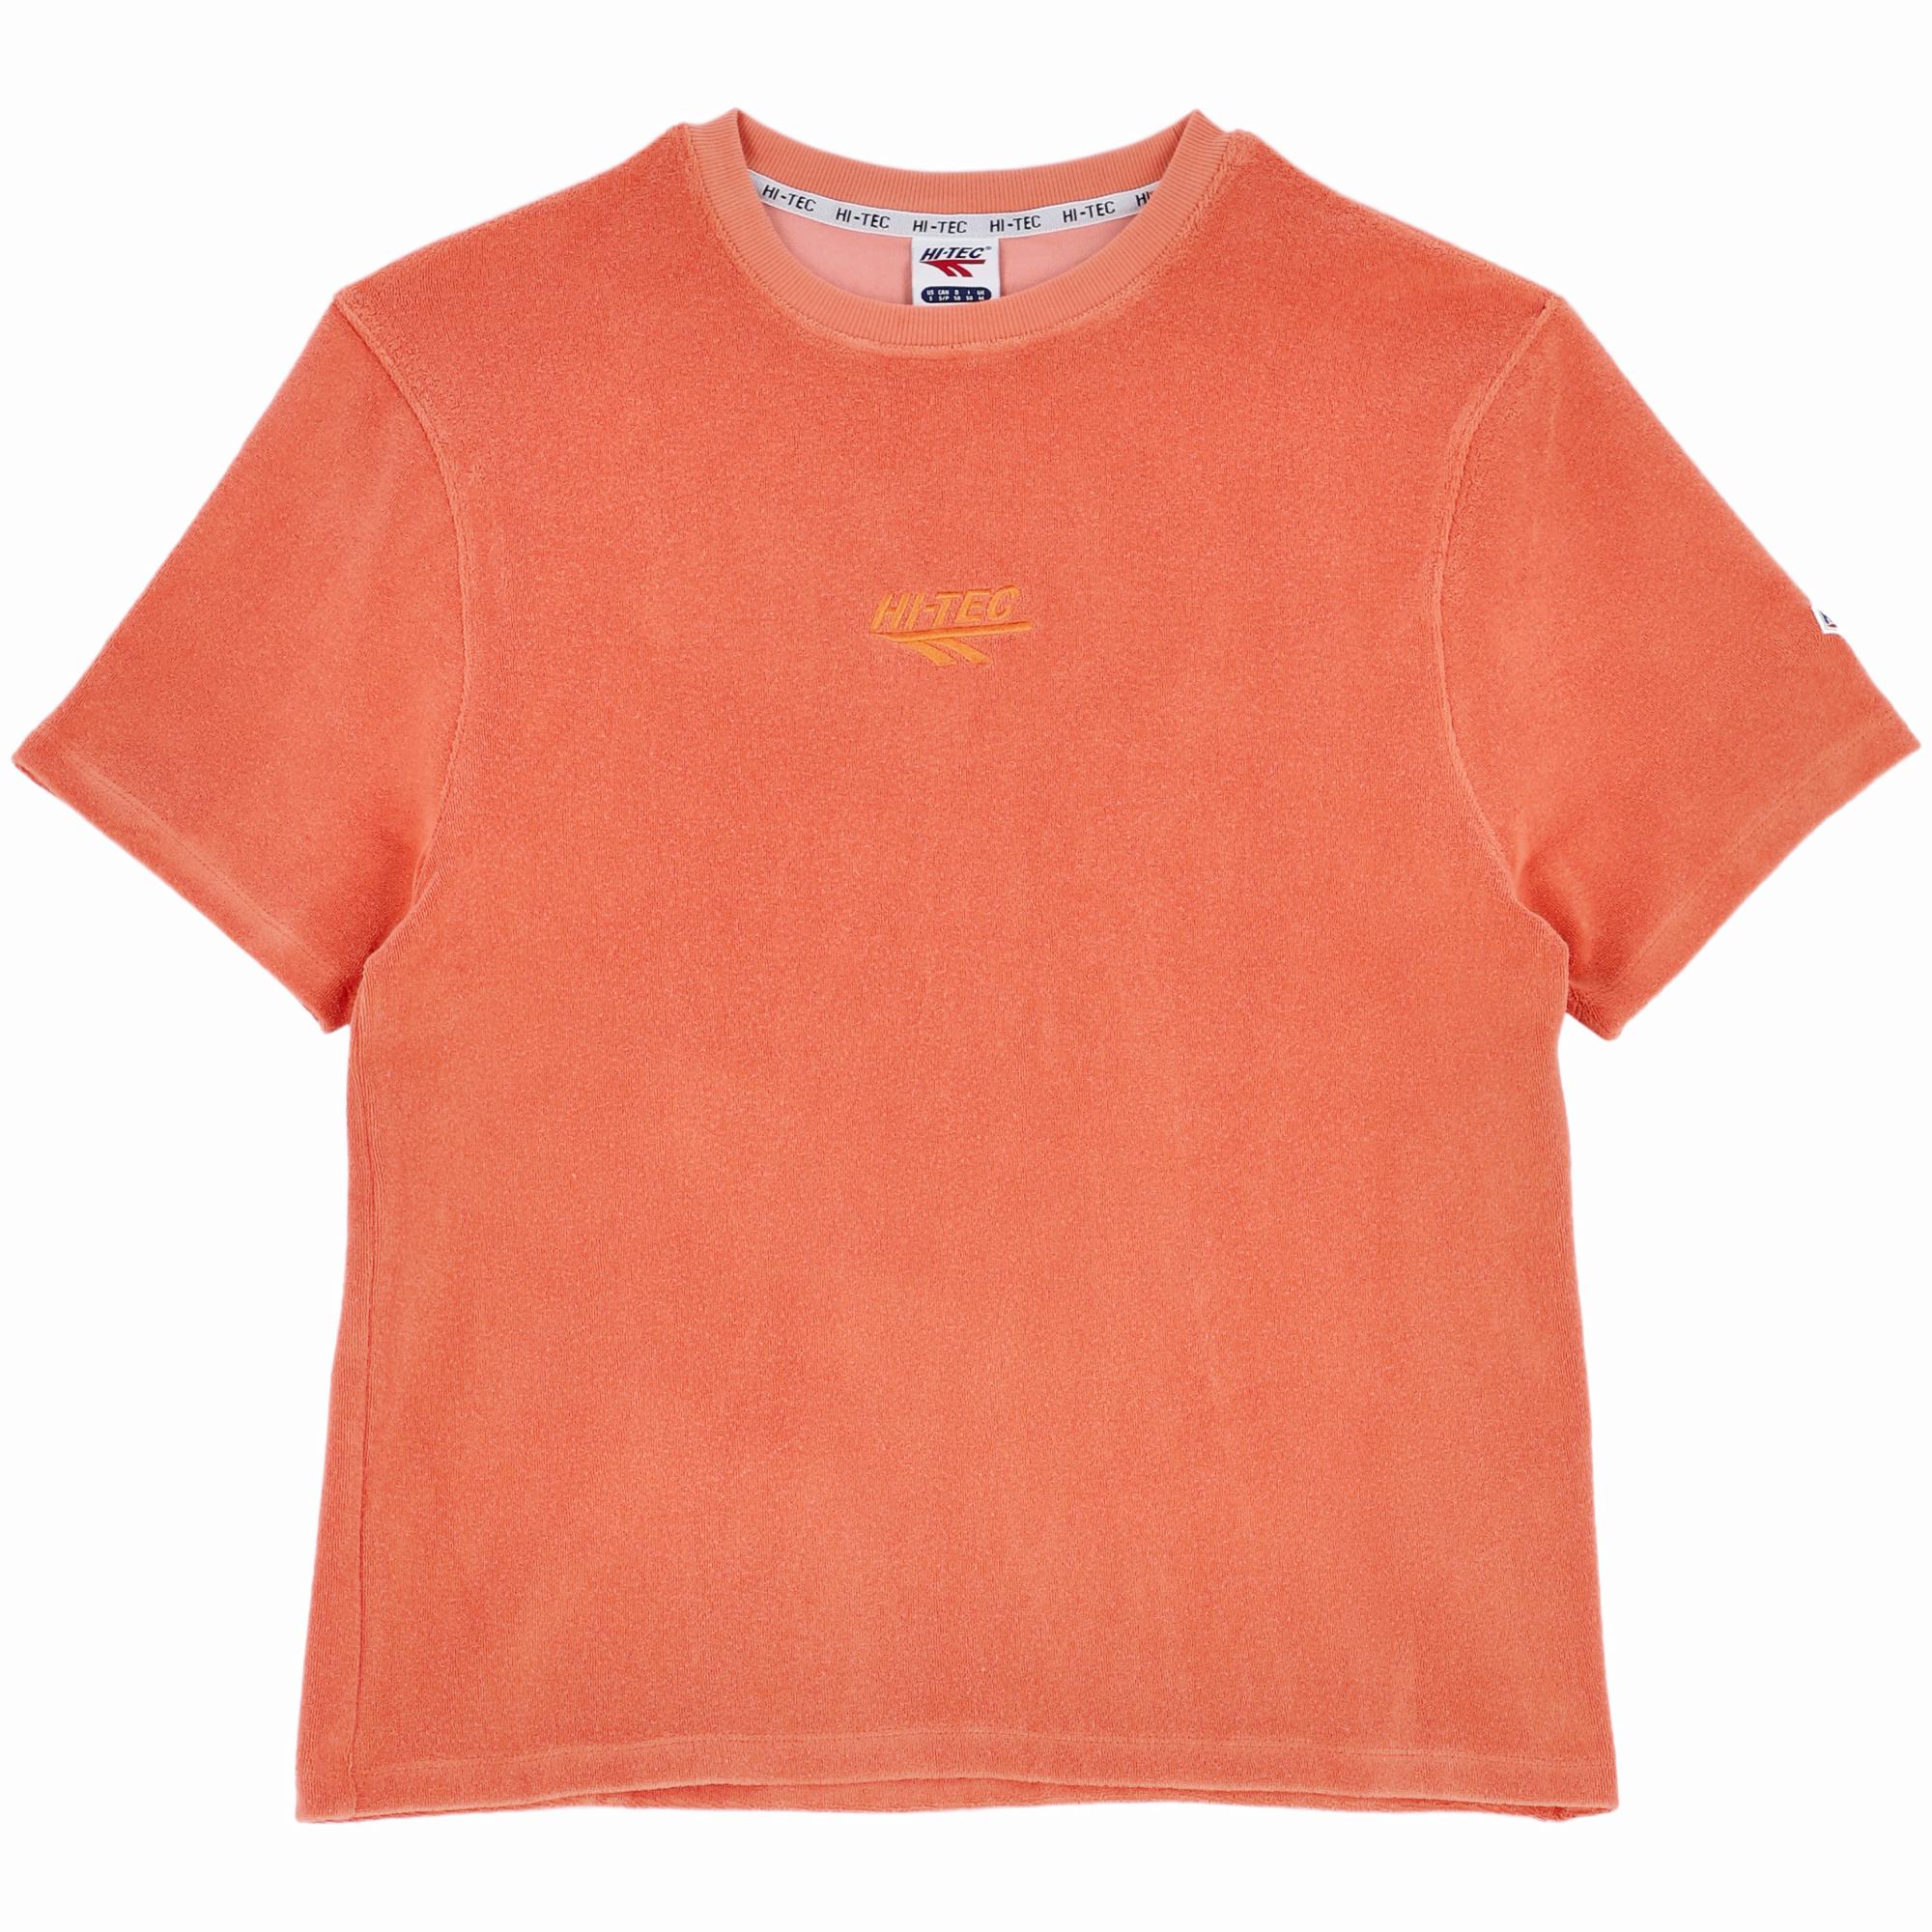 HI-TEC Abel t-shirt, soya, small